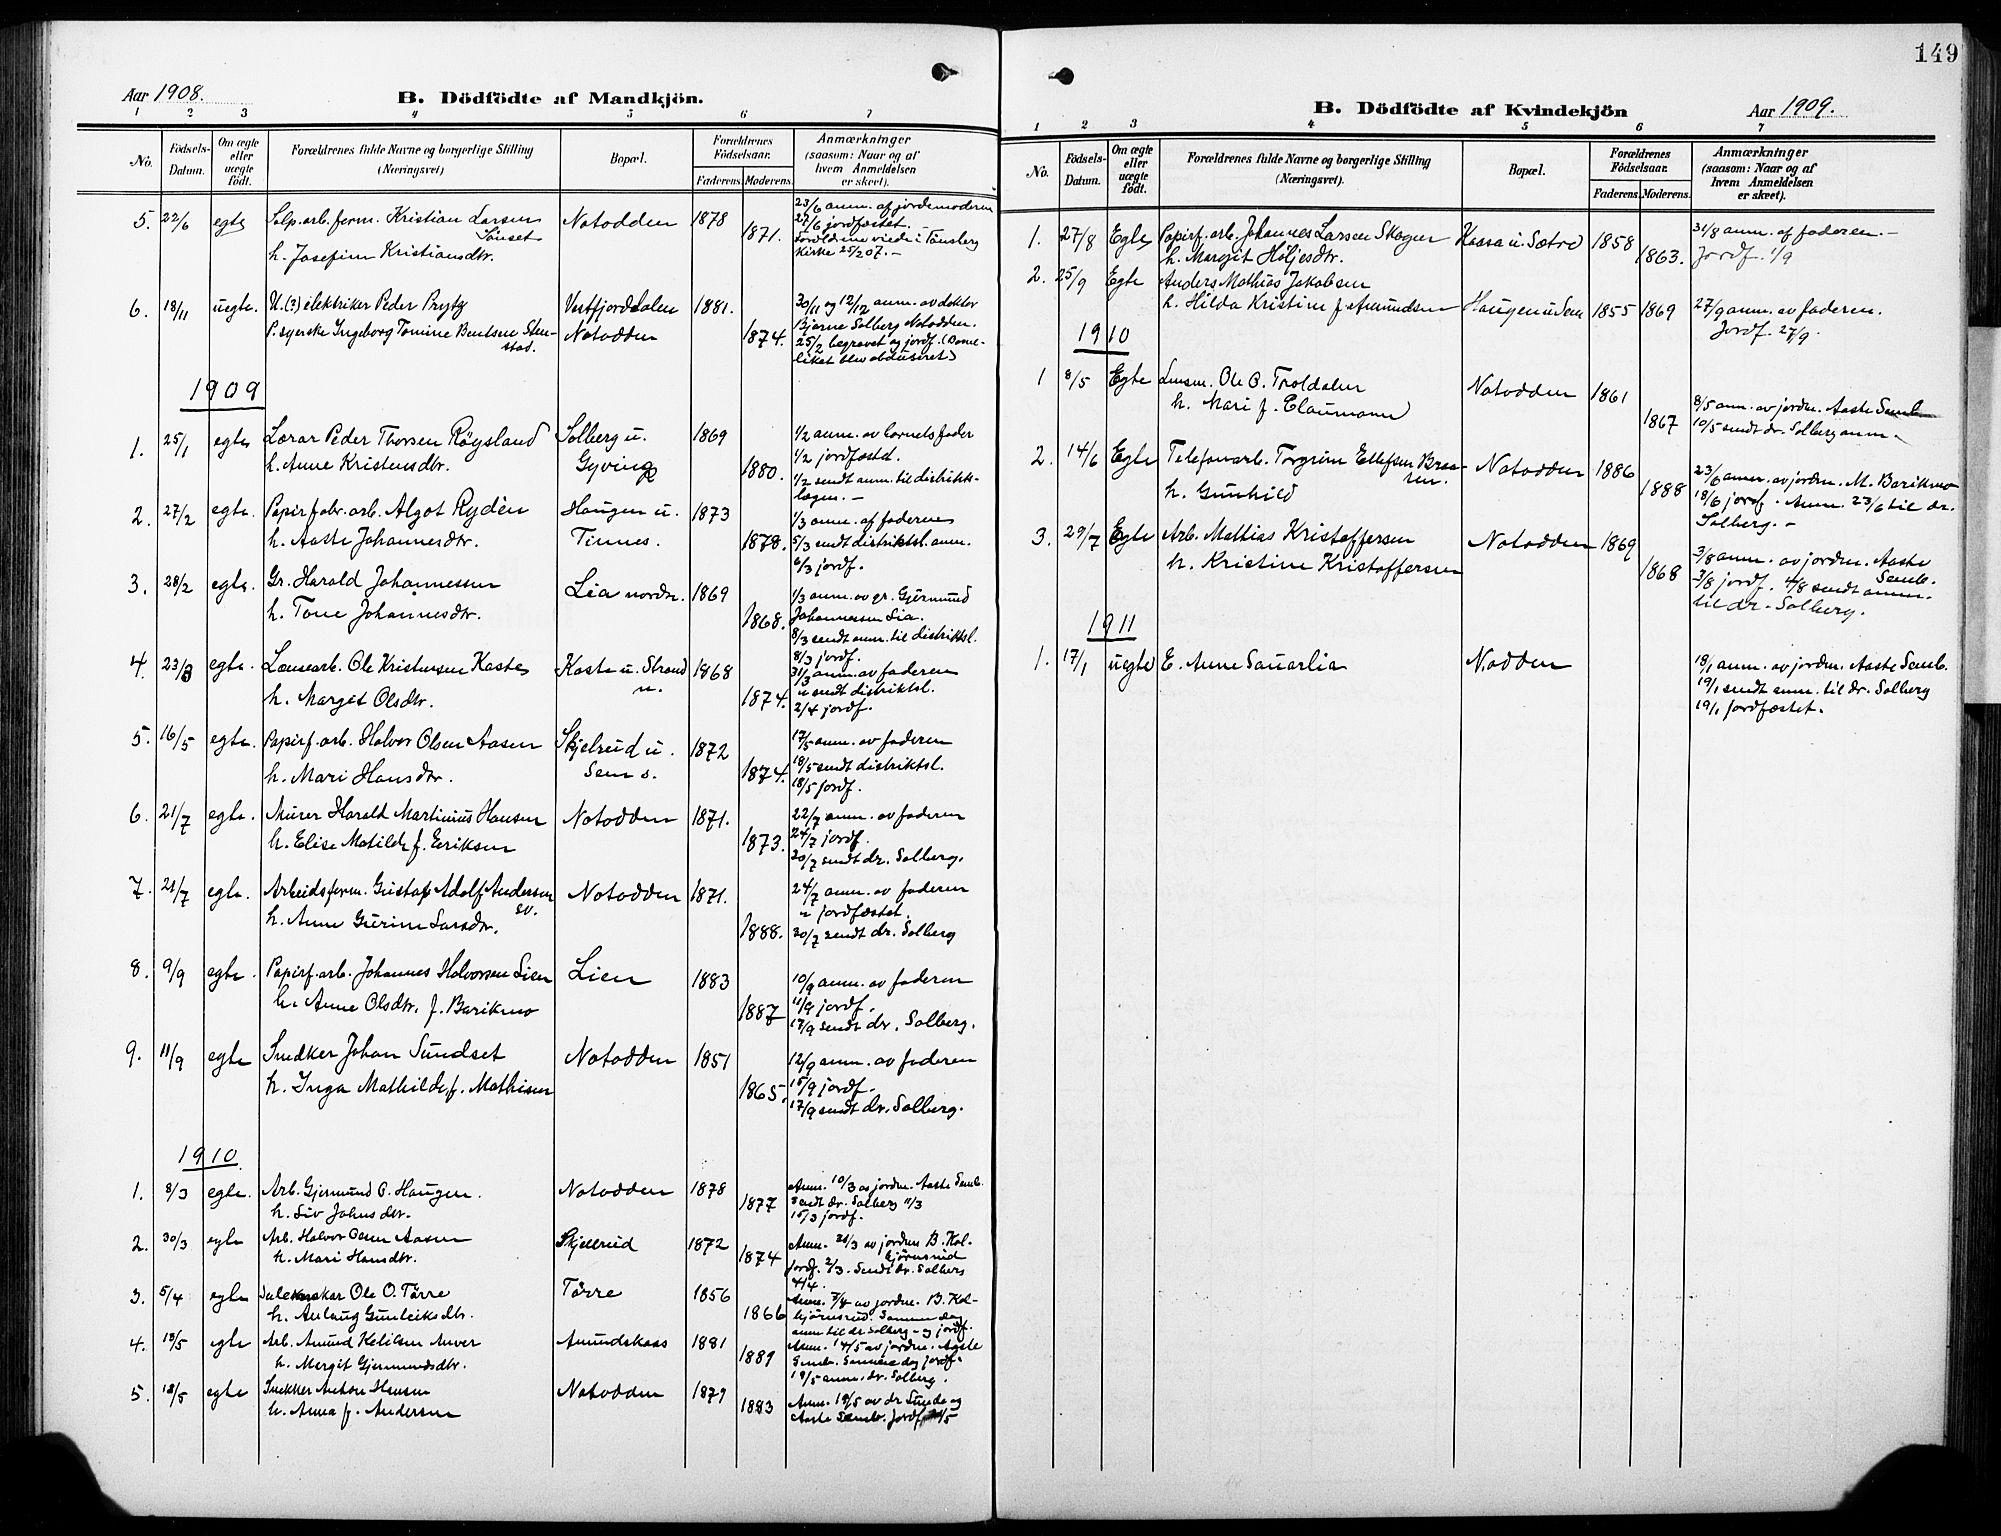 SAKO, Heddal kirkebøker, G/Ga/L0003: Klokkerbok nr. I 3, 1908-1932, s. 149